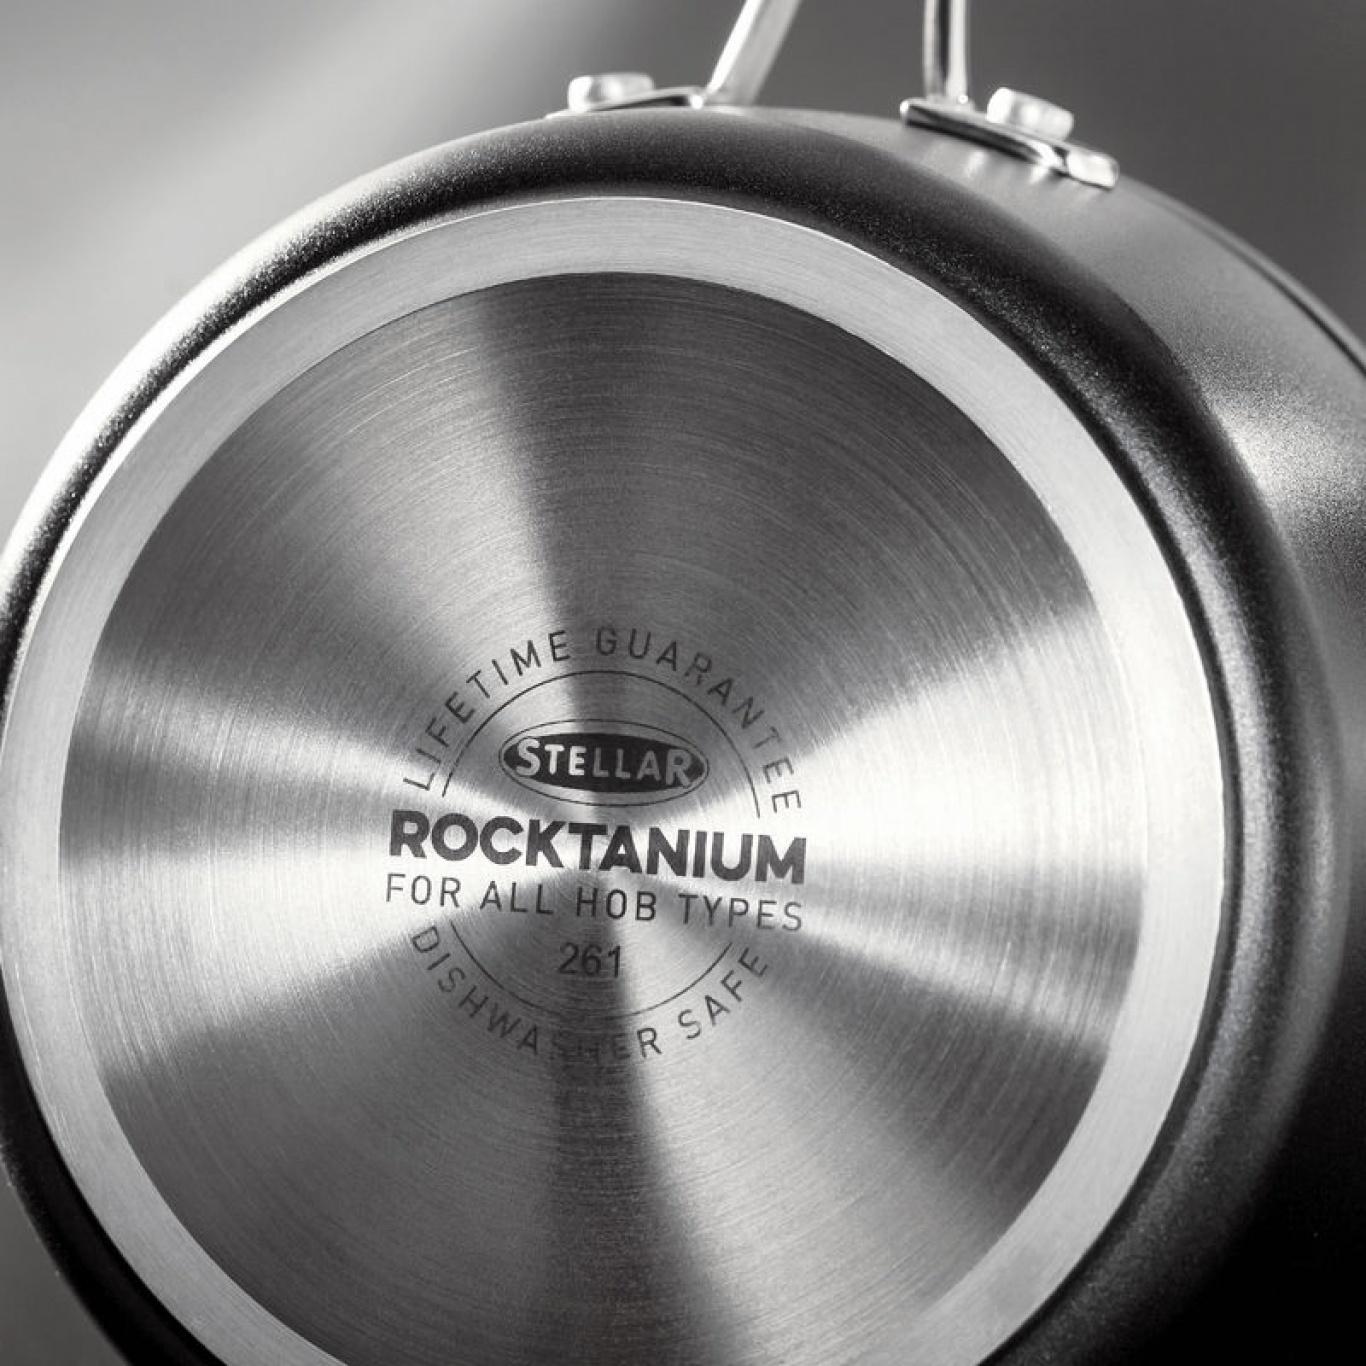 Stellar Rocktanium 20cm Saucepan